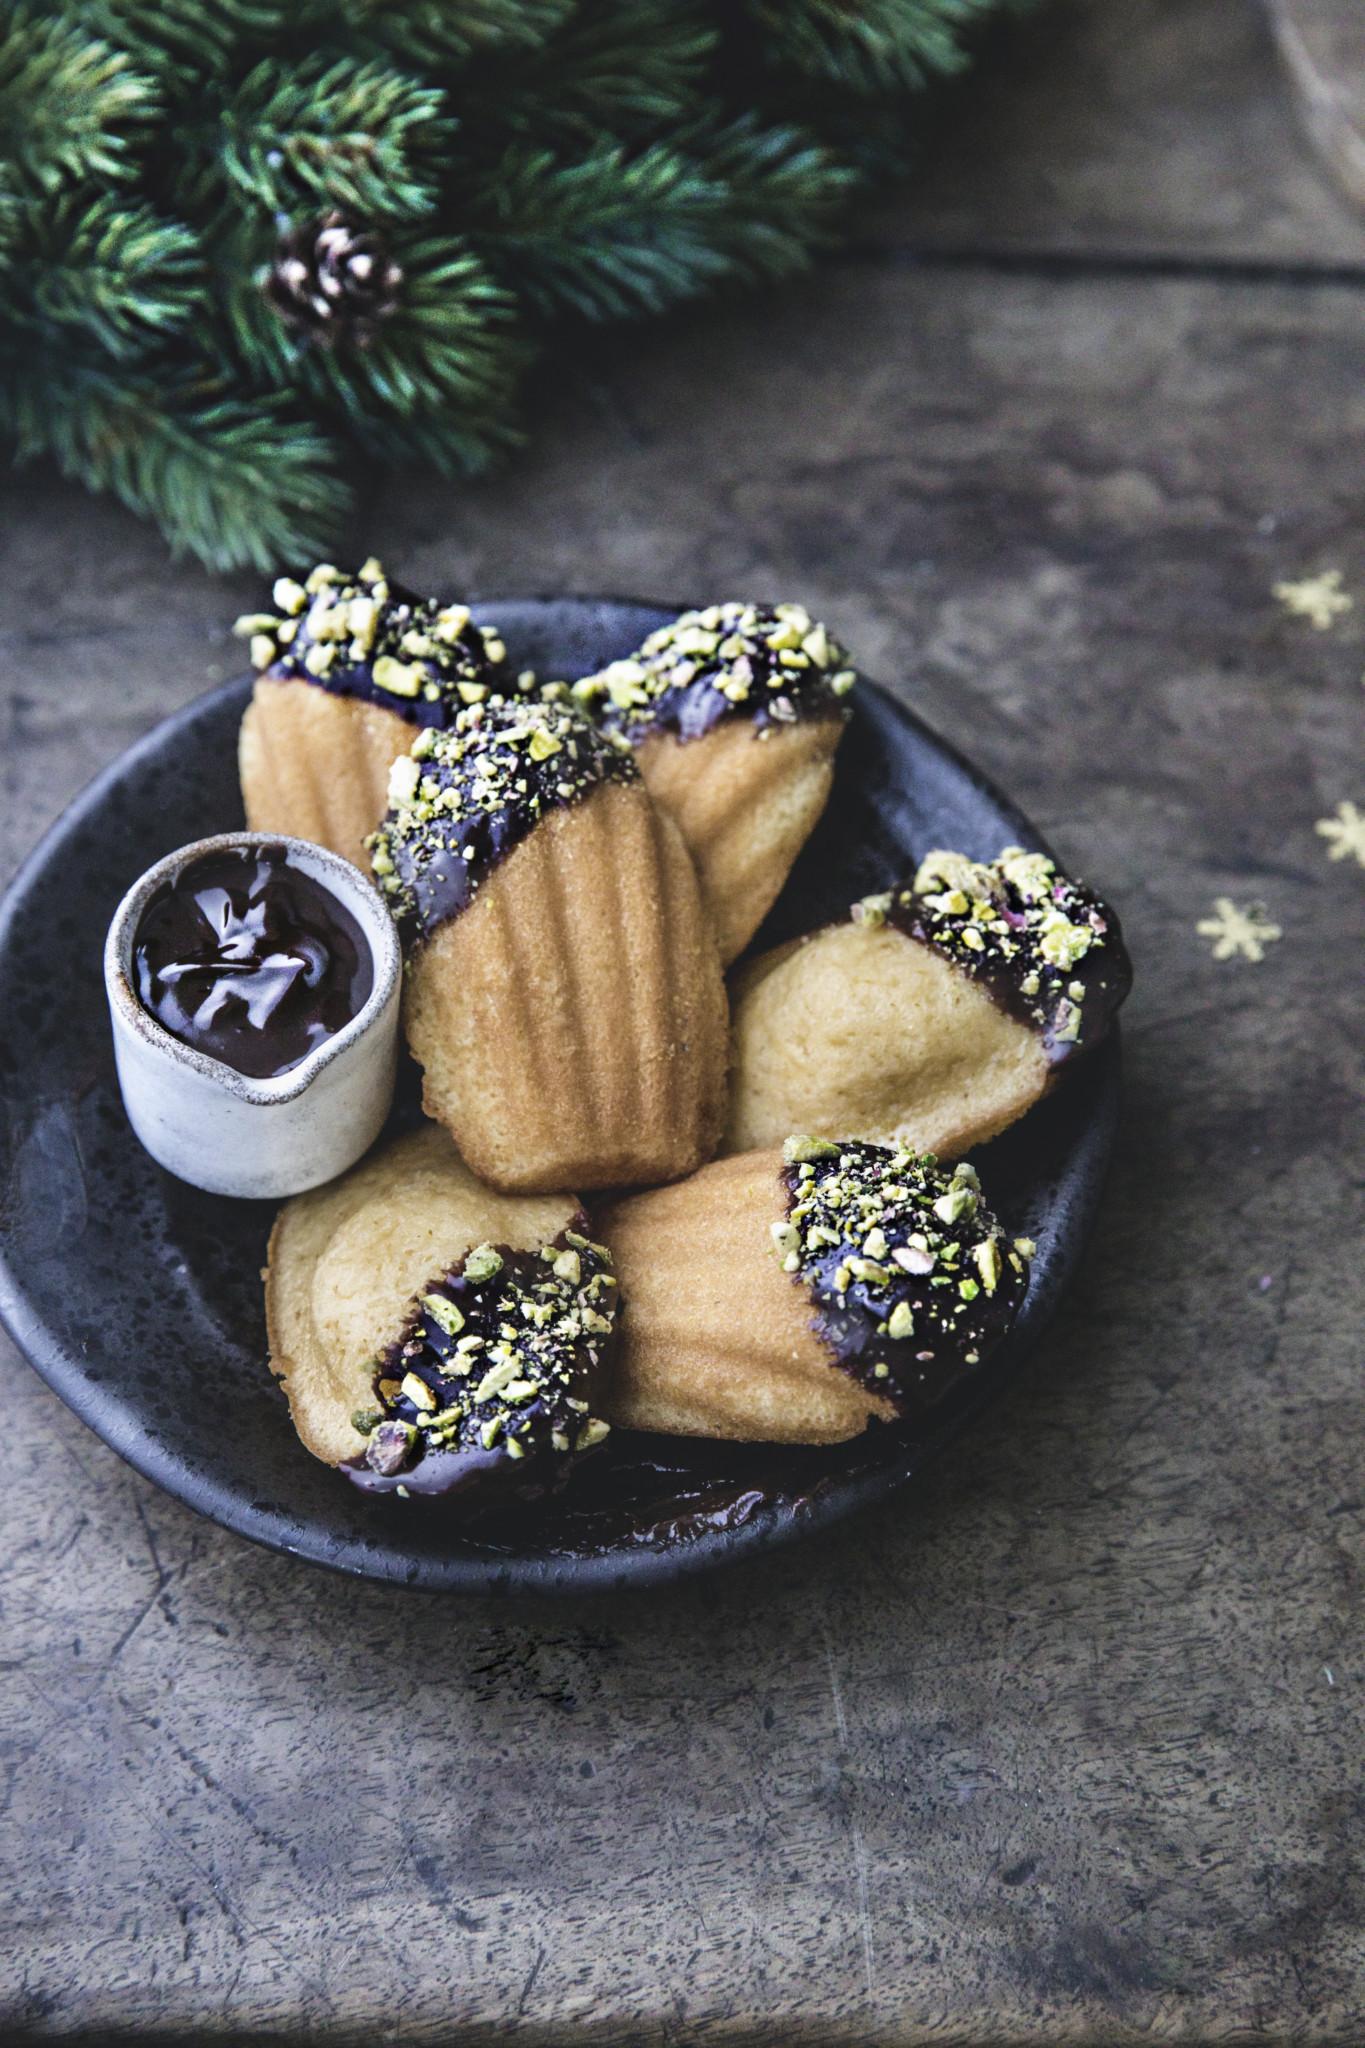 Chocolate dipped madeleine